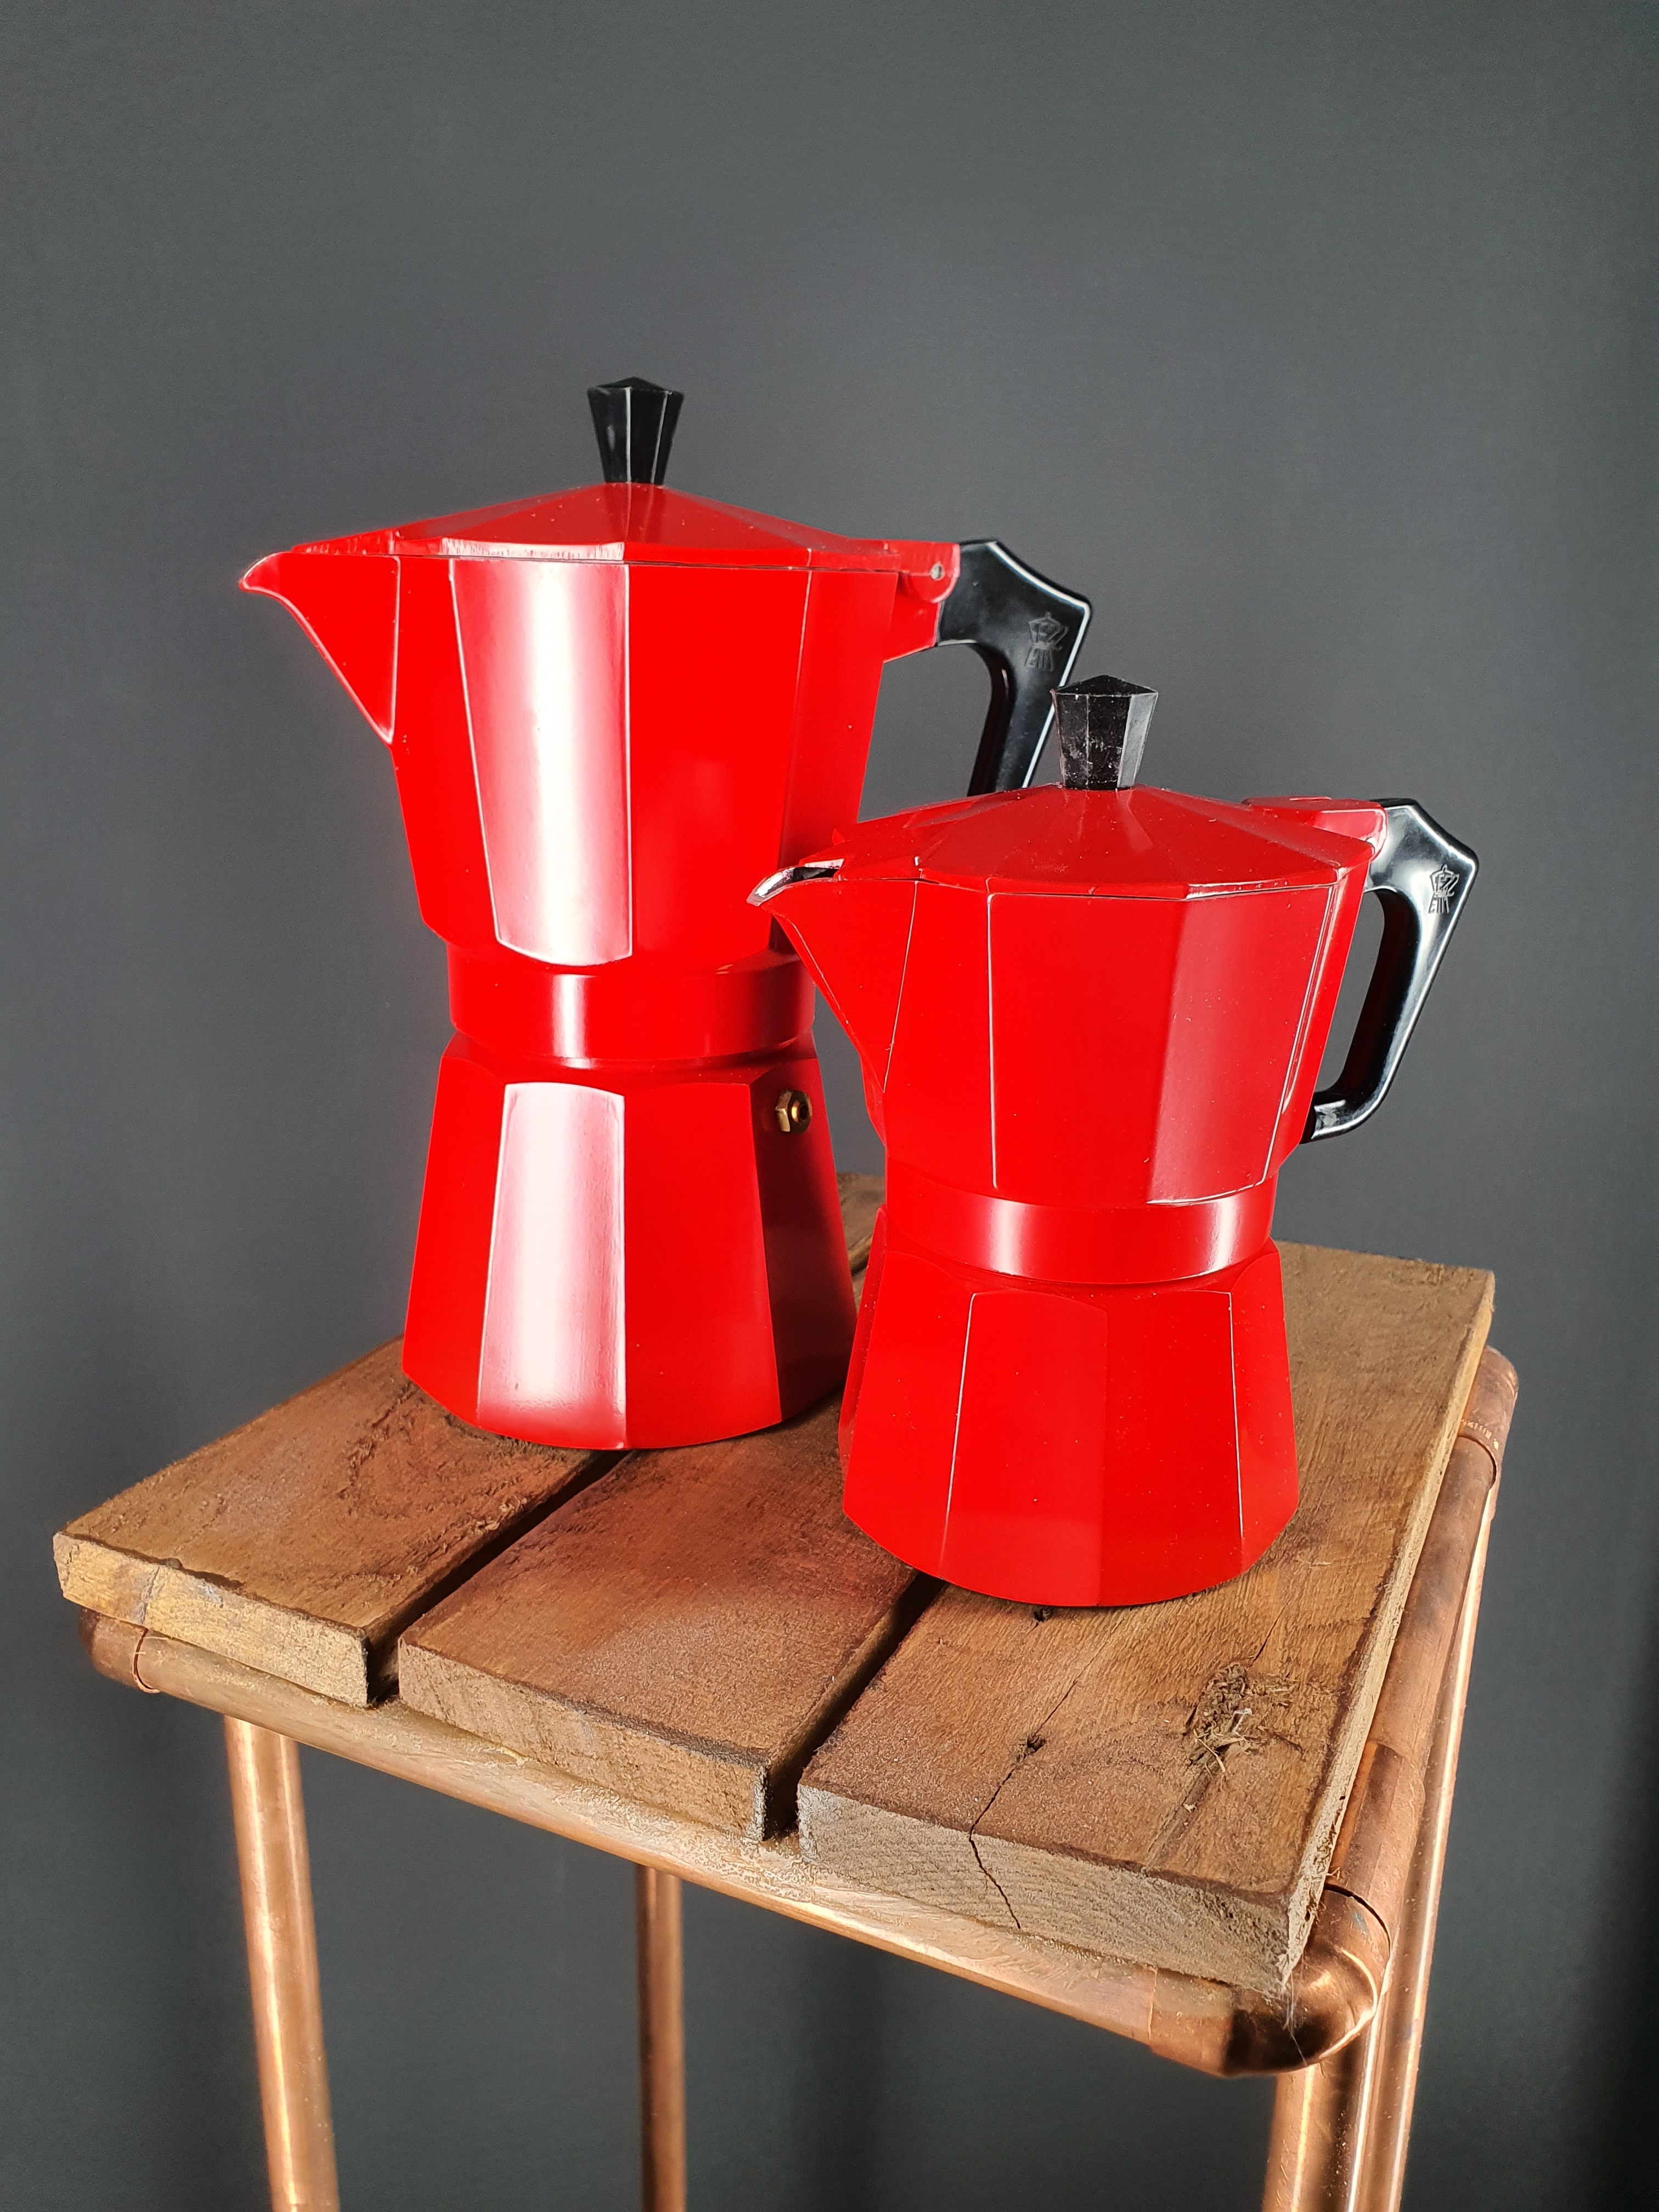 Pezzetti Stovetop 3 cup